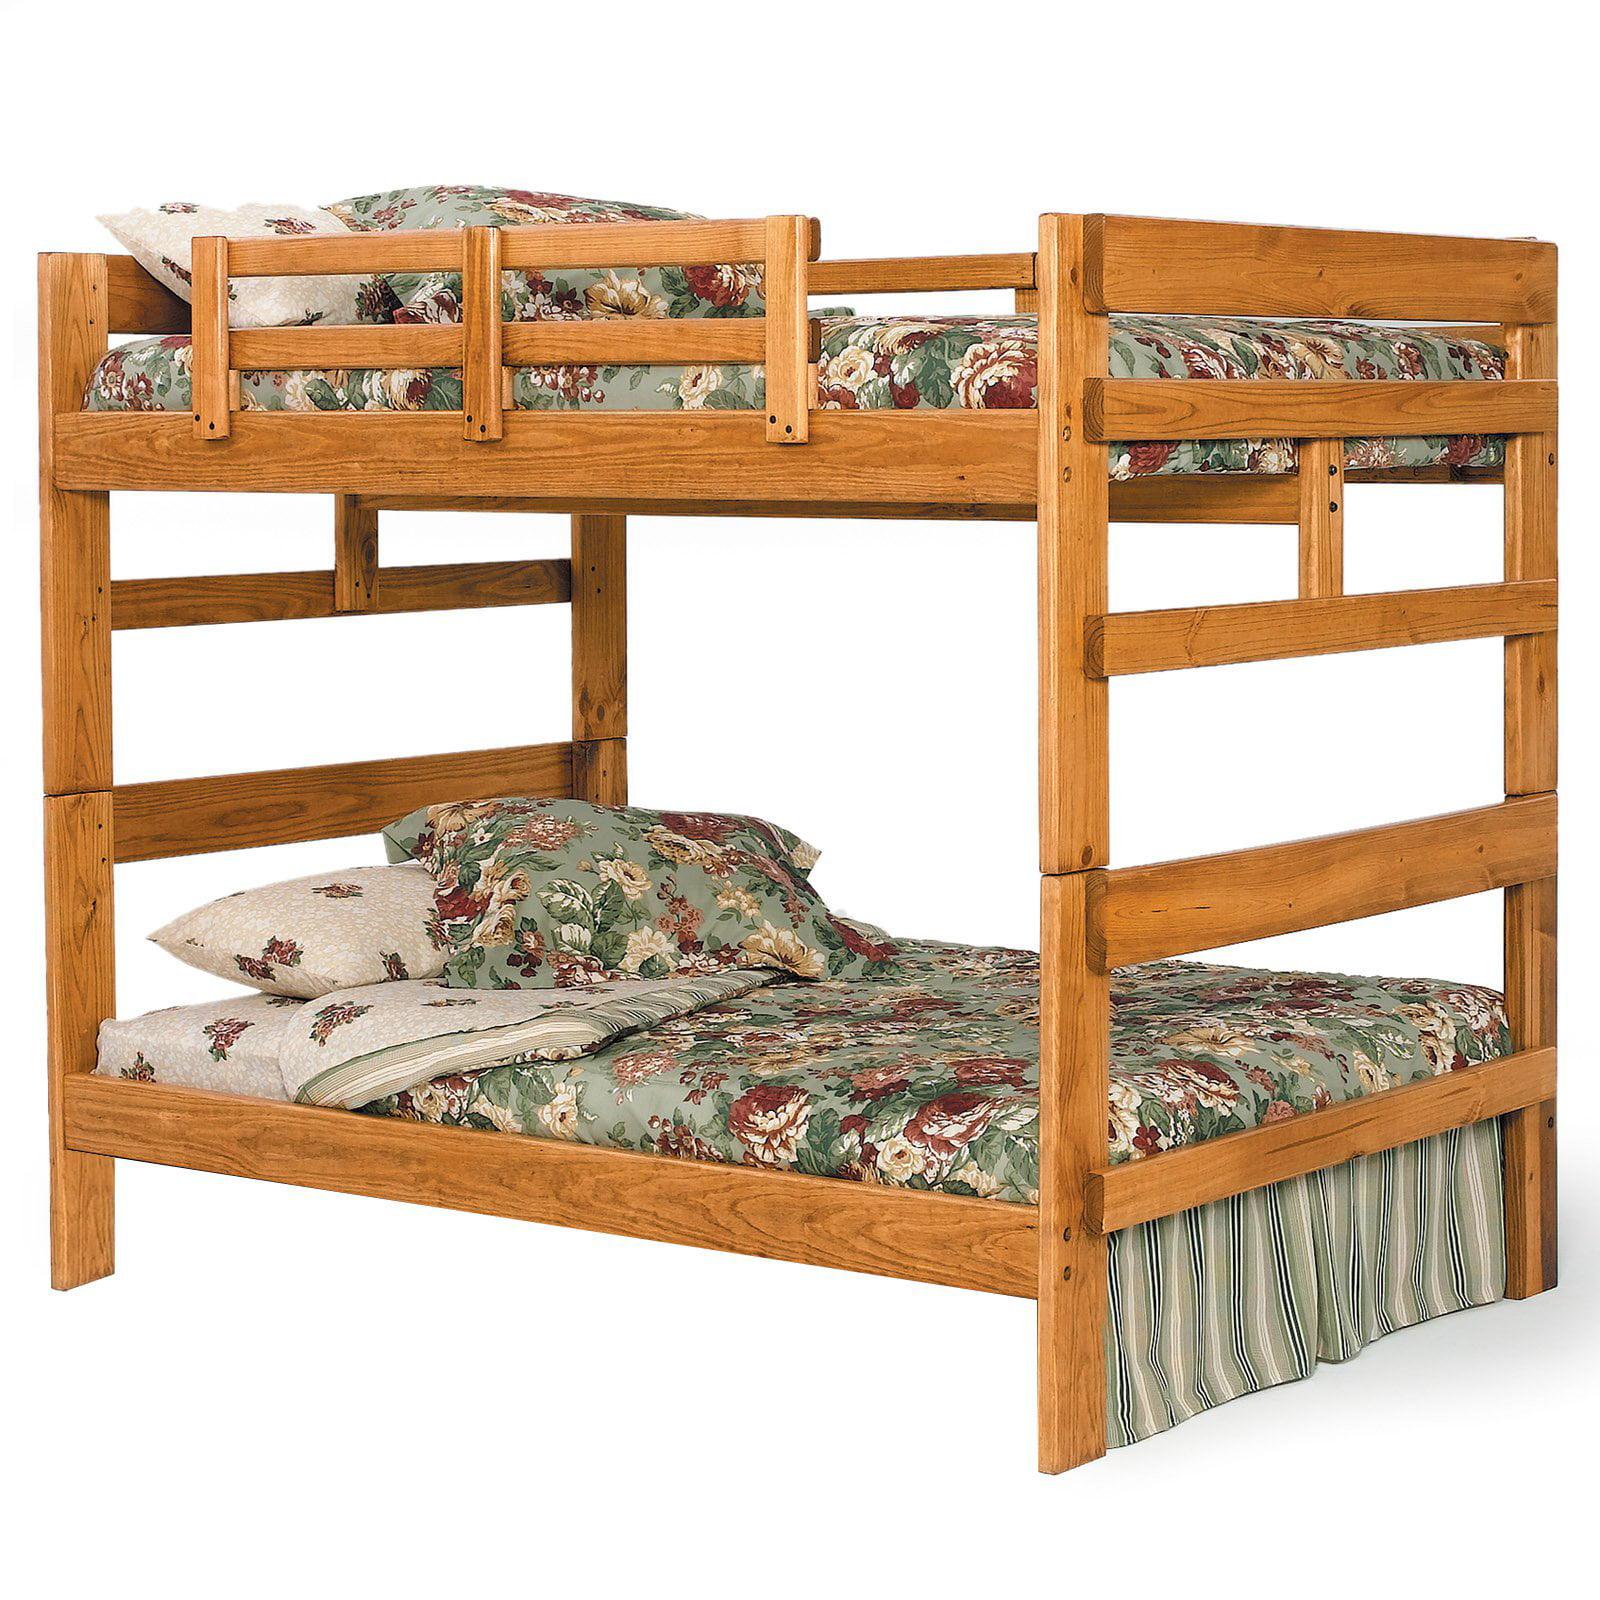 Woodcrest Heartland Full over Full Bunk Bed